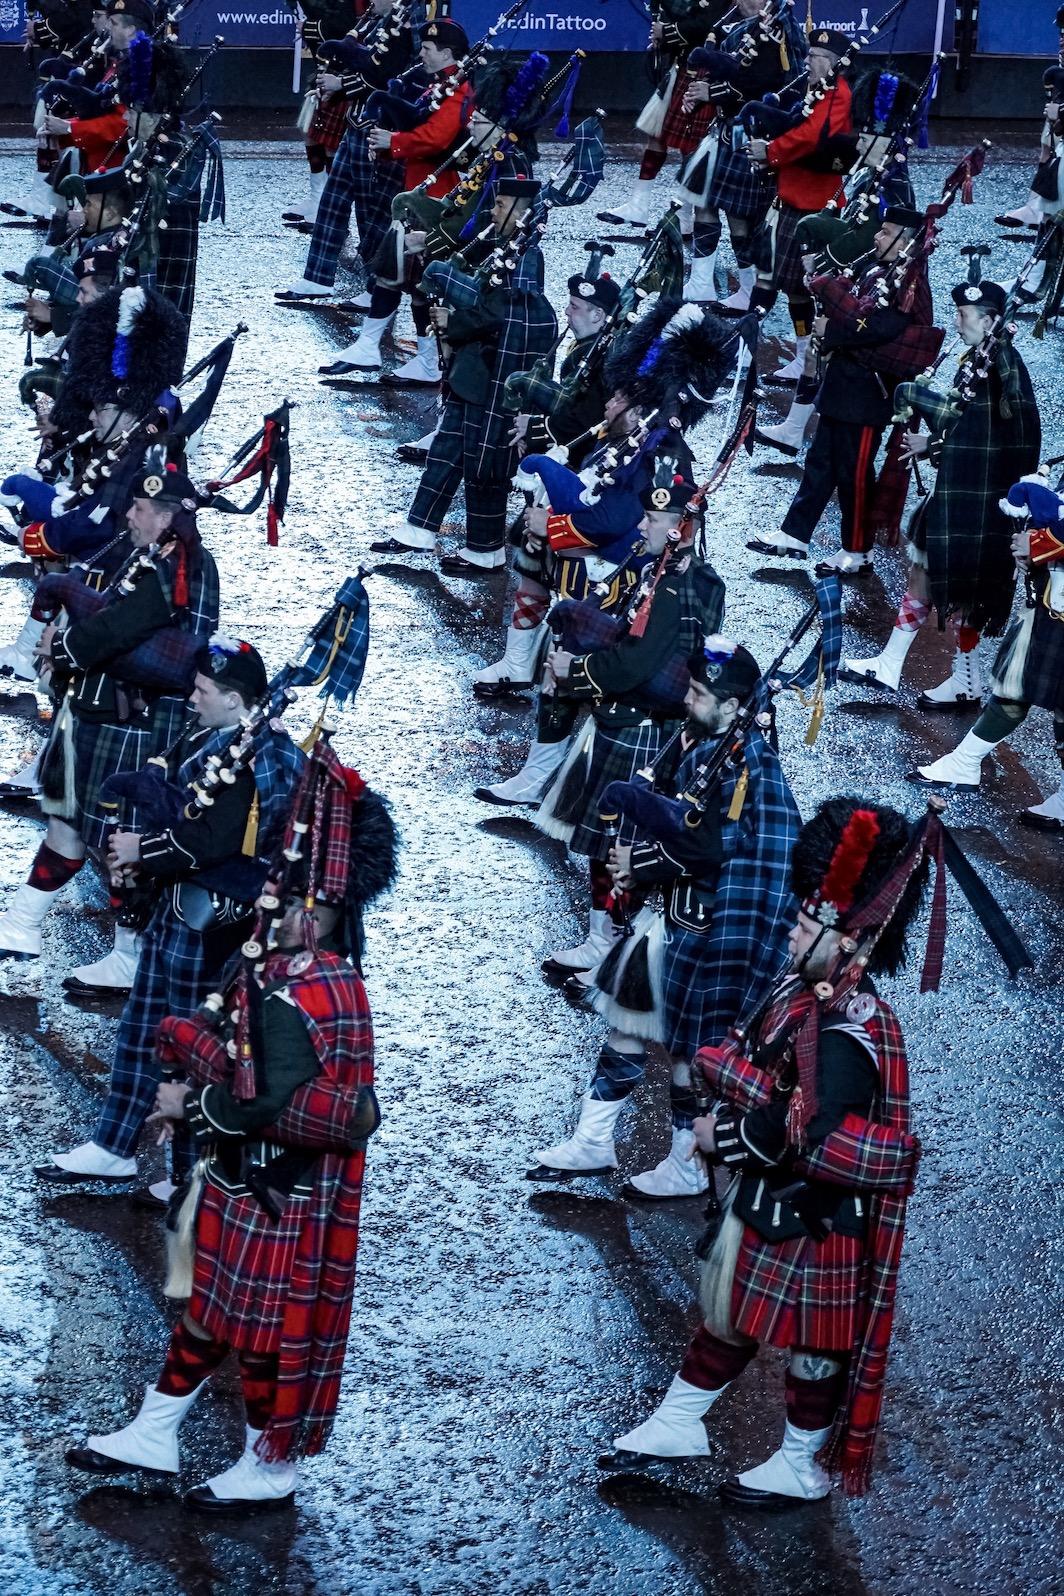 Edinburgh | Taptoe